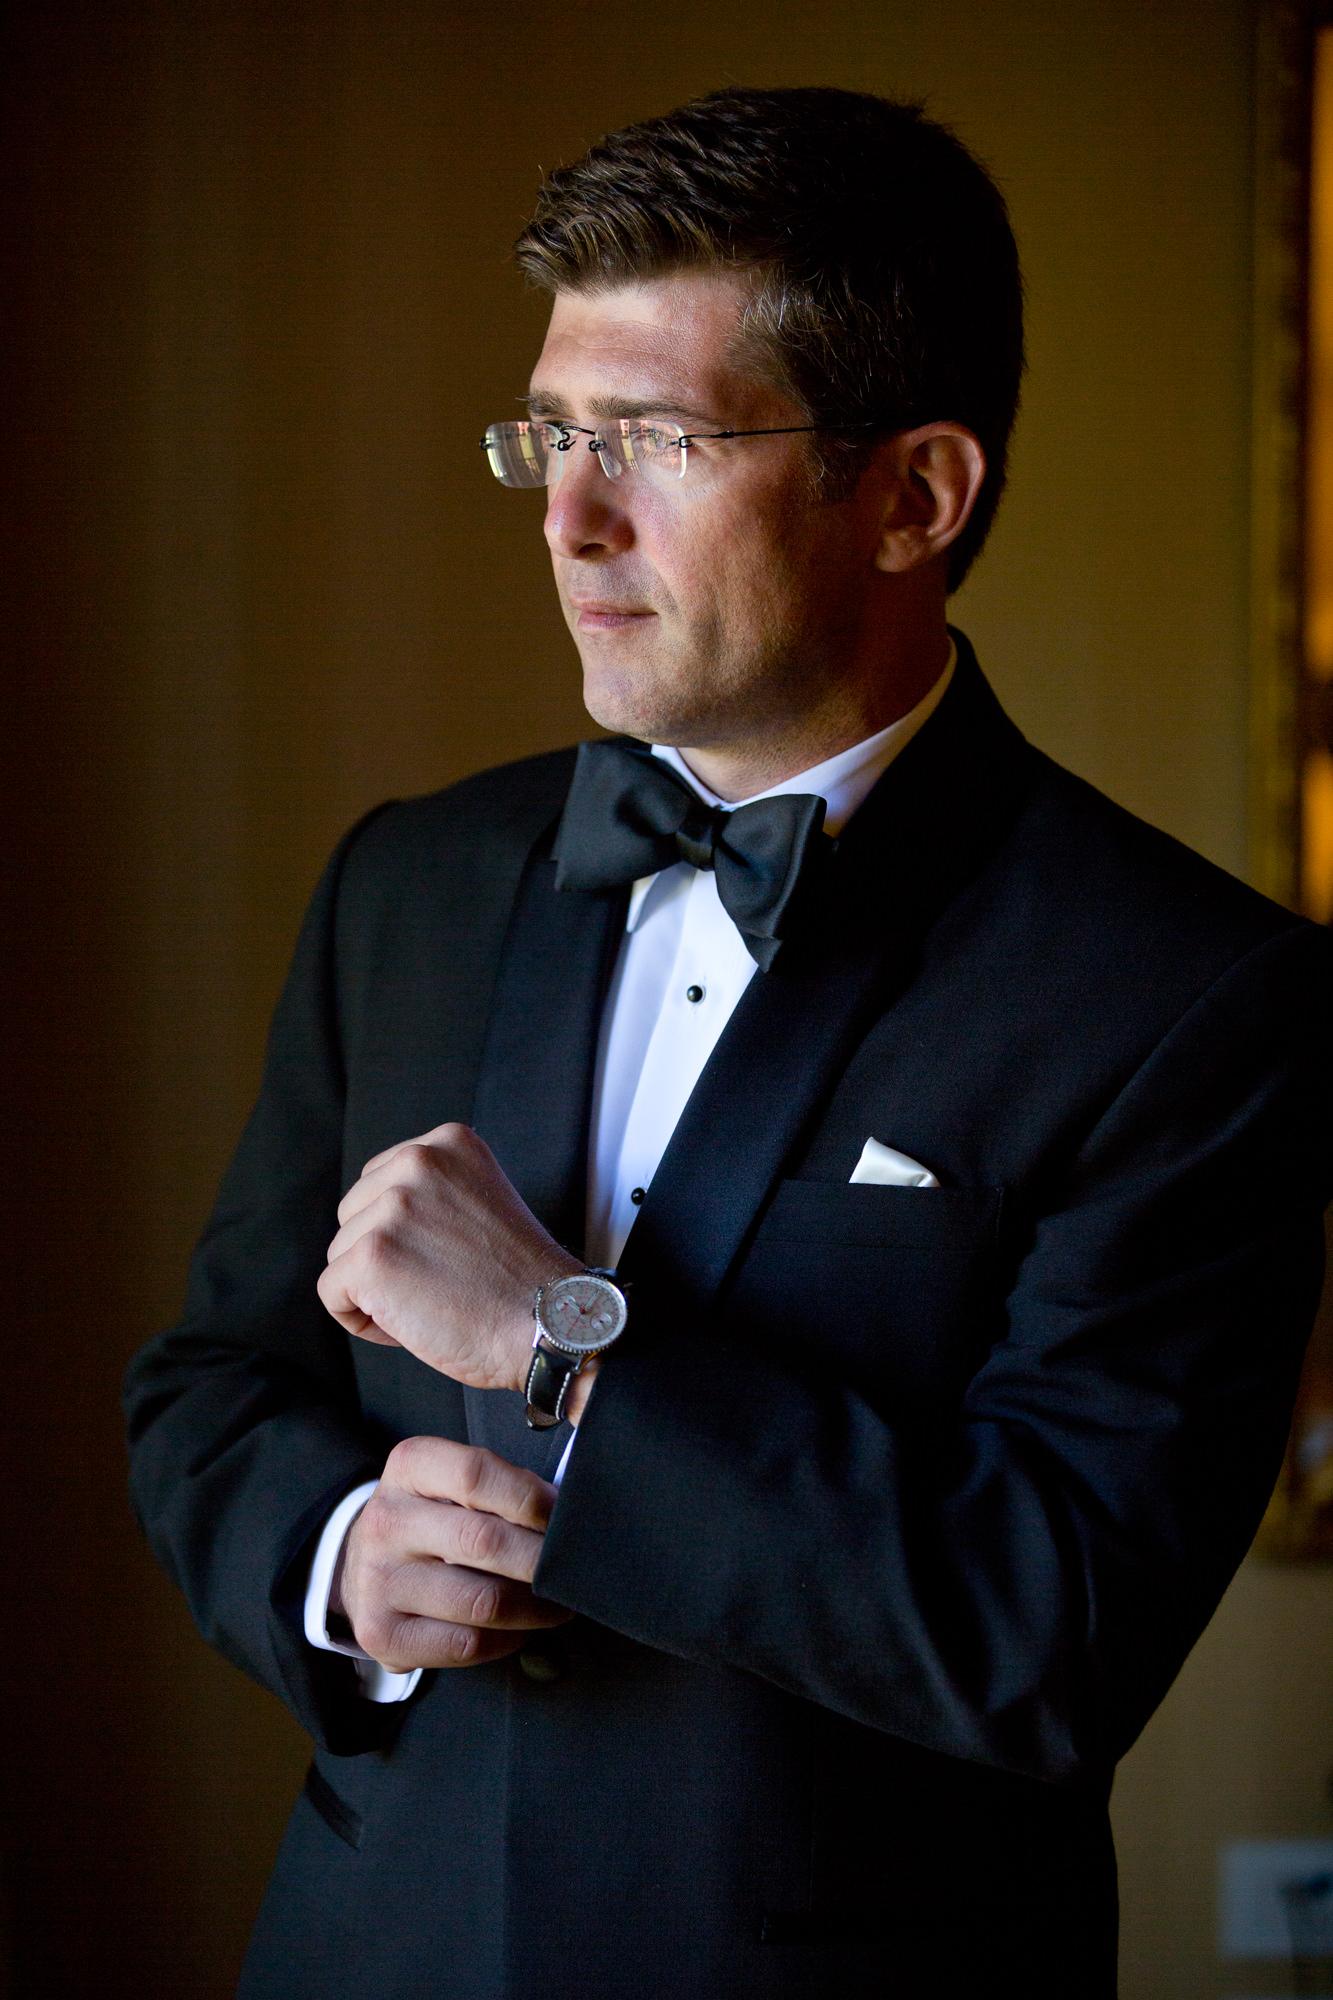 Portrait of groom getting ready by Roberto Valenzuela